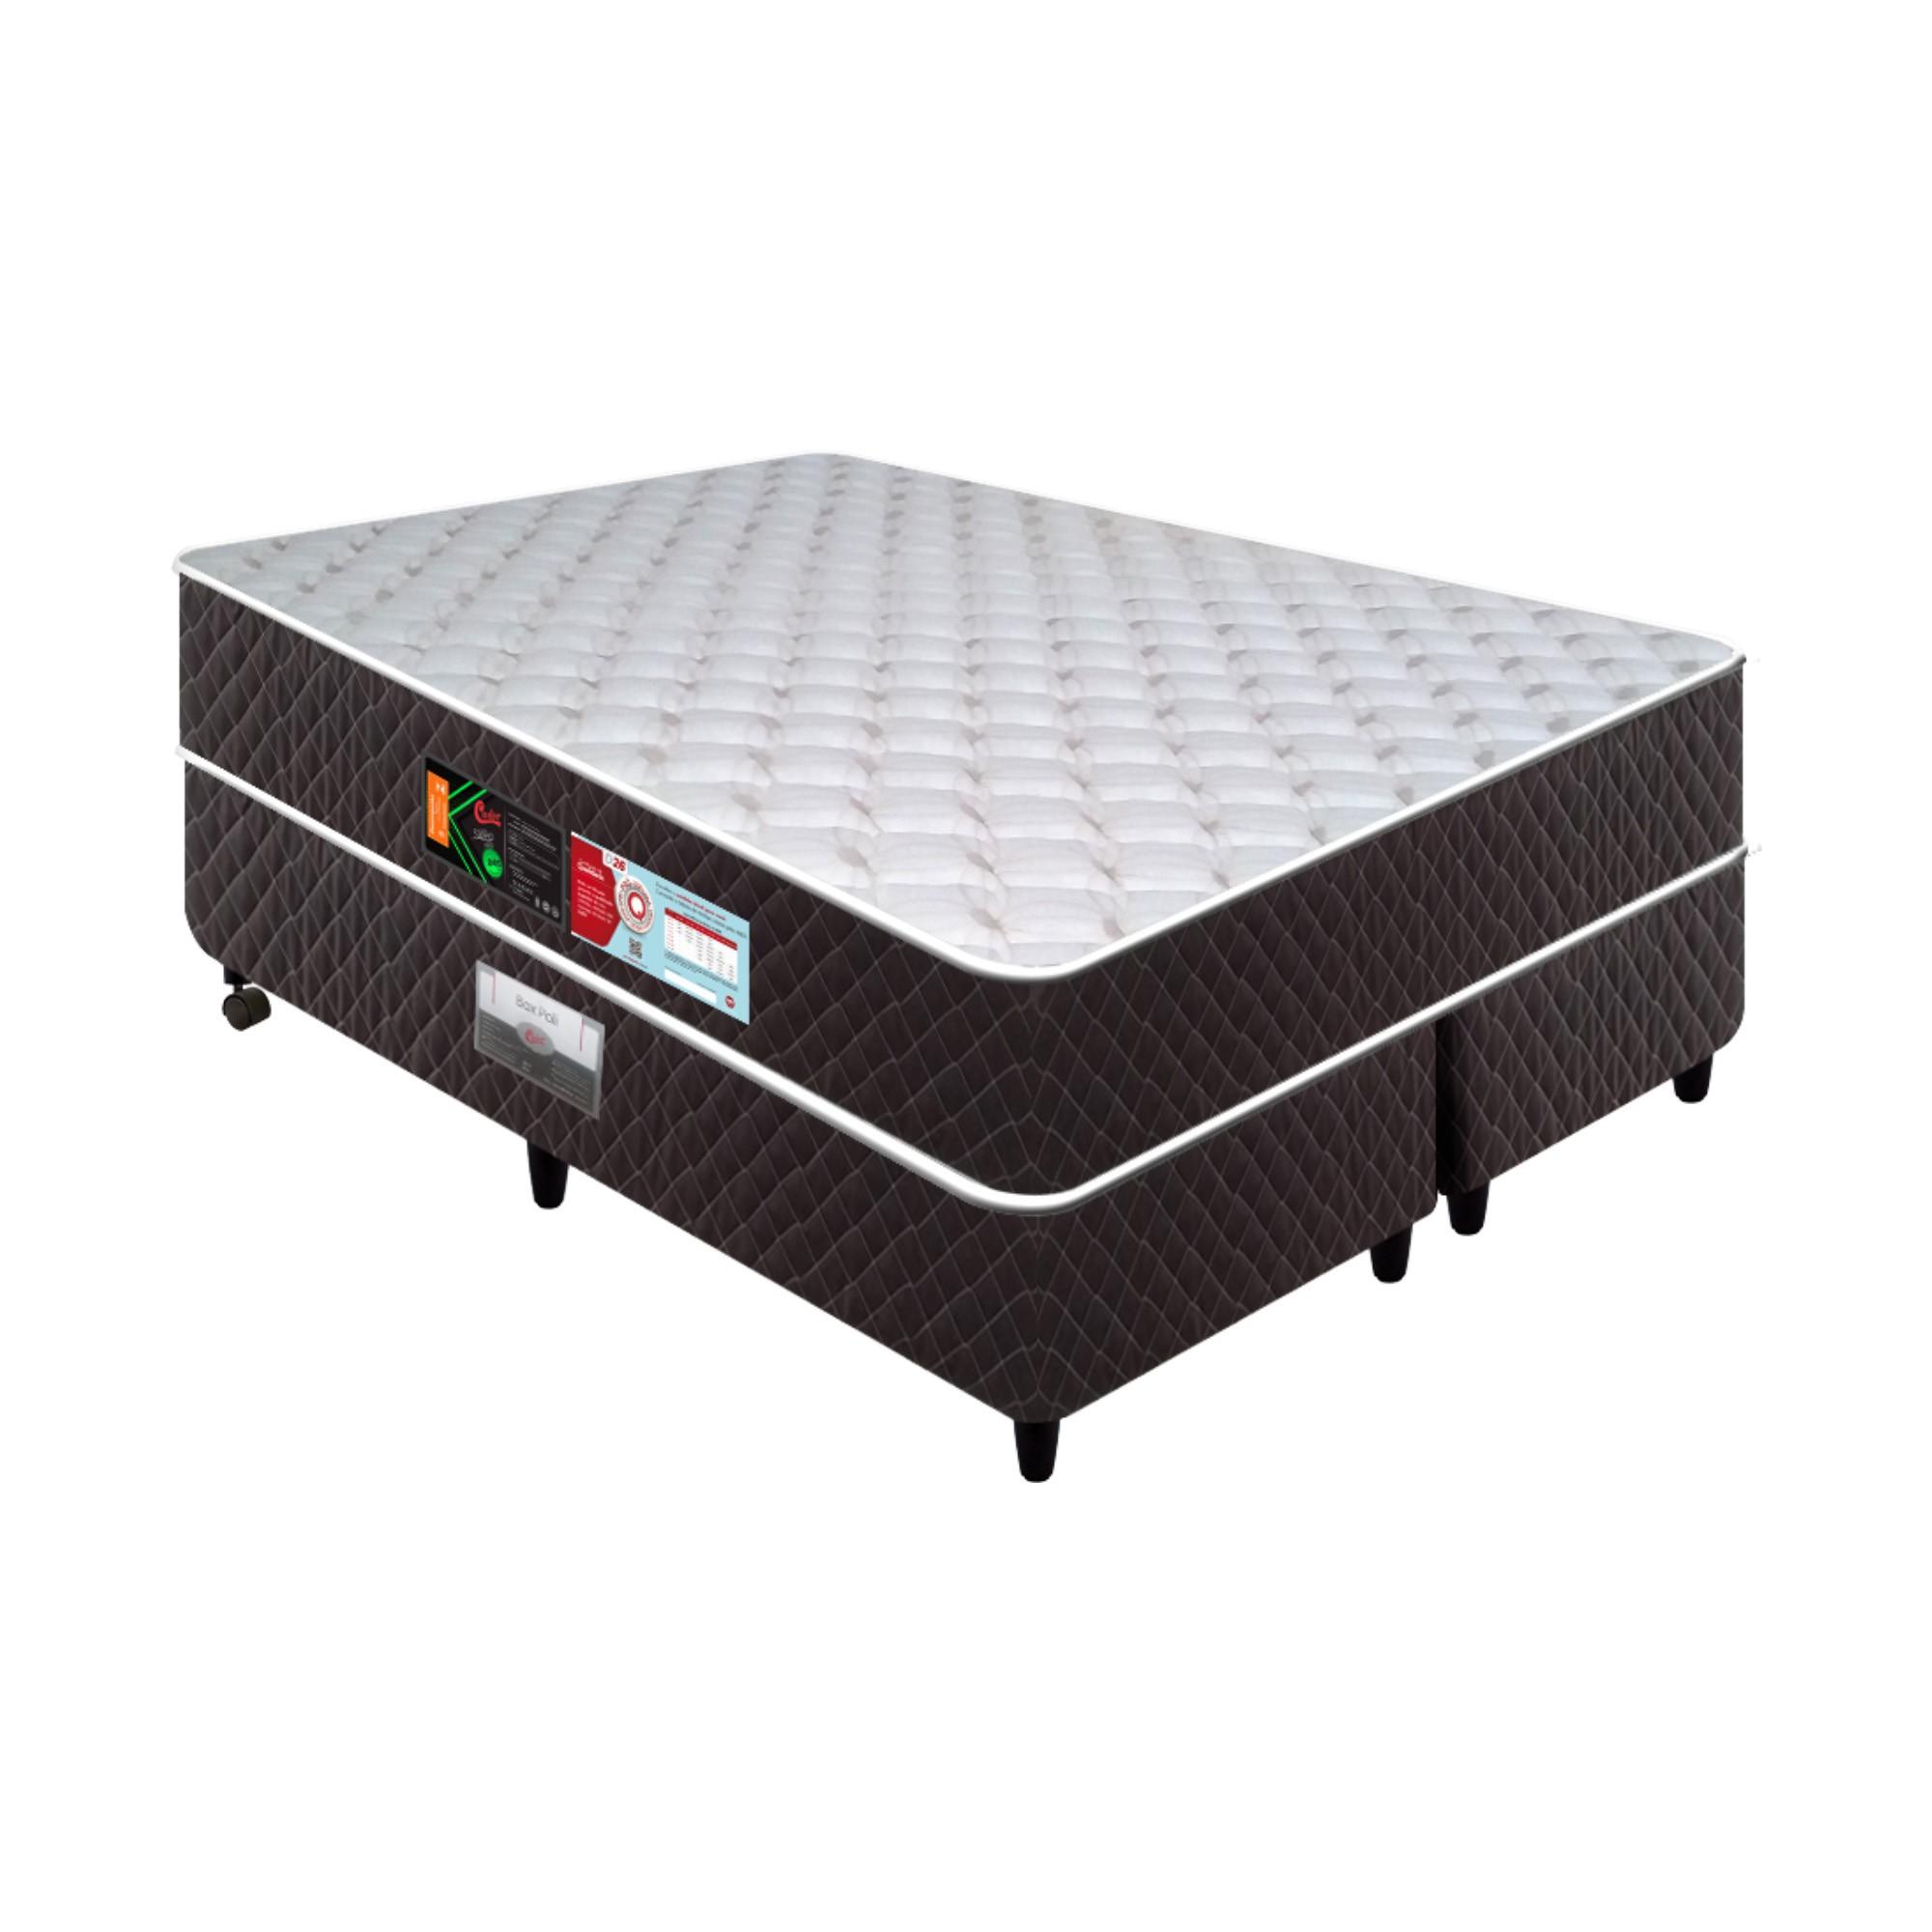 Conjunto Box Castor Sleep Max D45 [Viúva 128 x 188 cm]